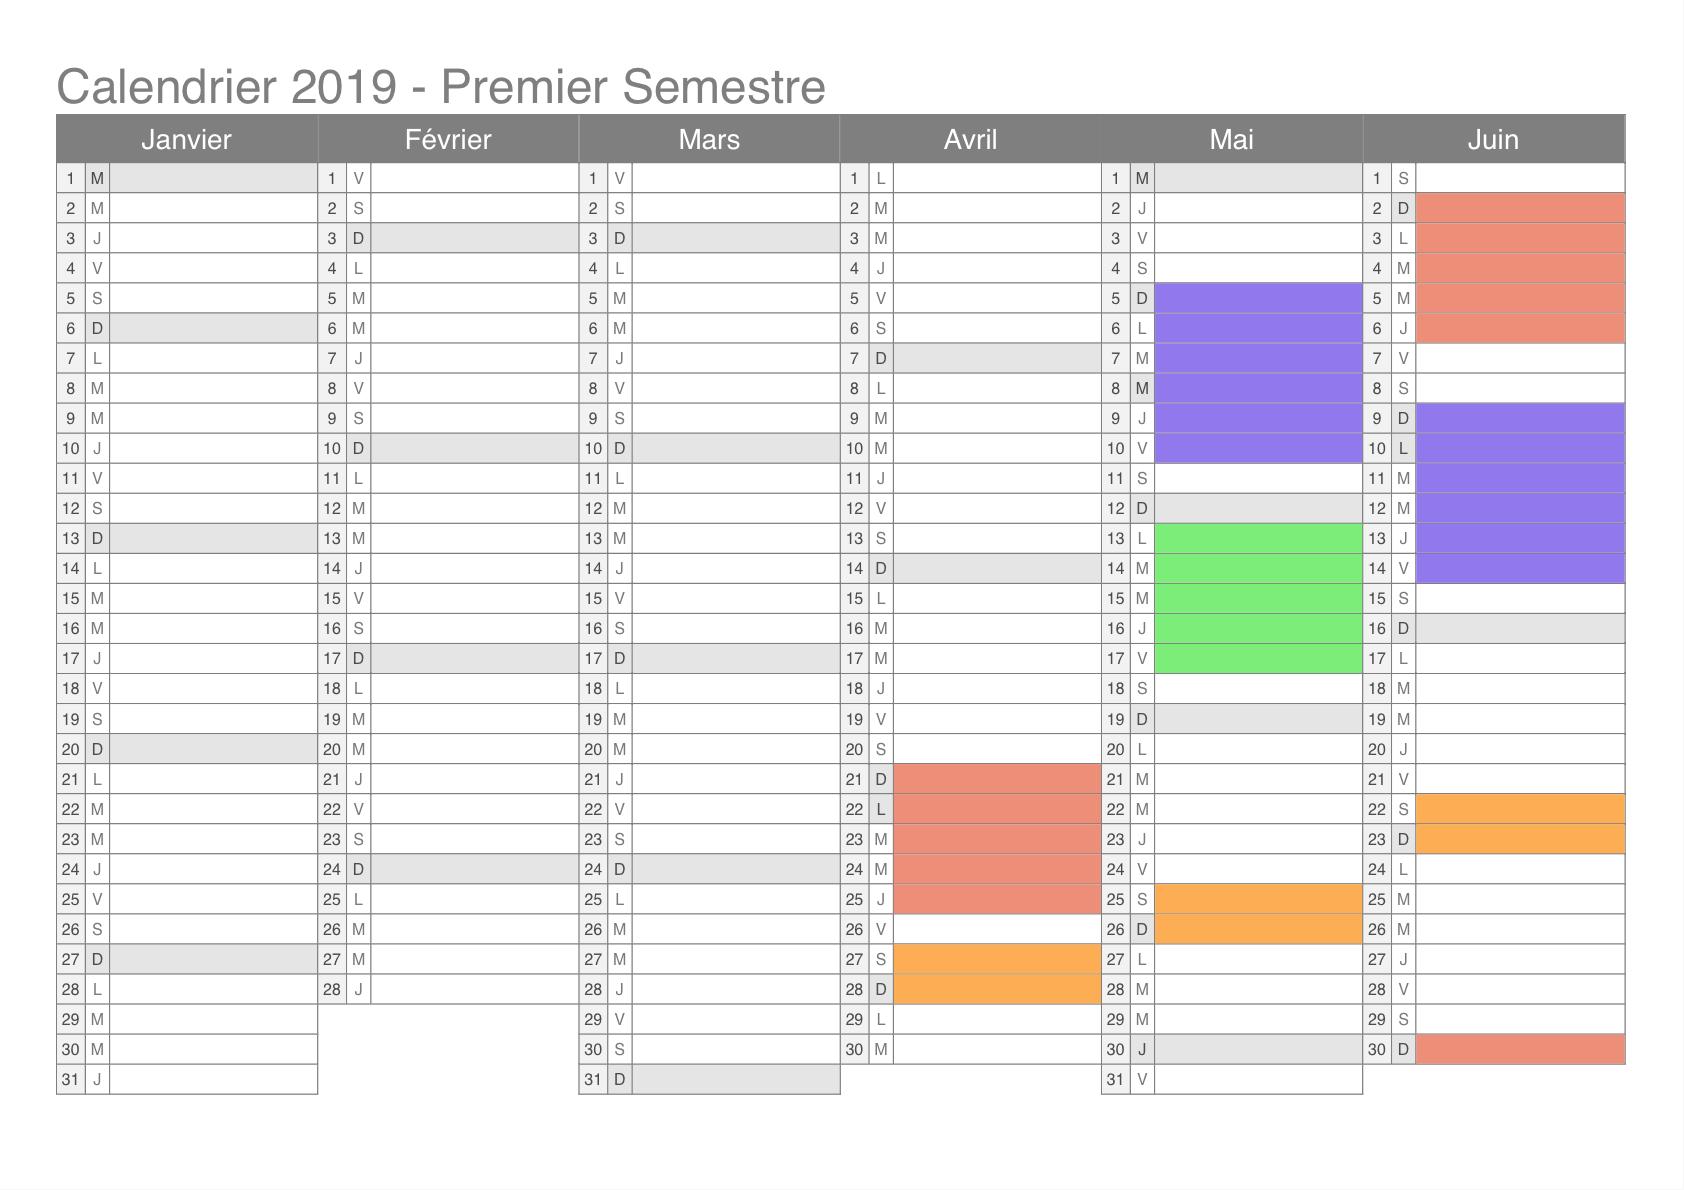 Calendrier 2019 Semestre 1.Calendrier 2019 Cheval Et Patrimoine